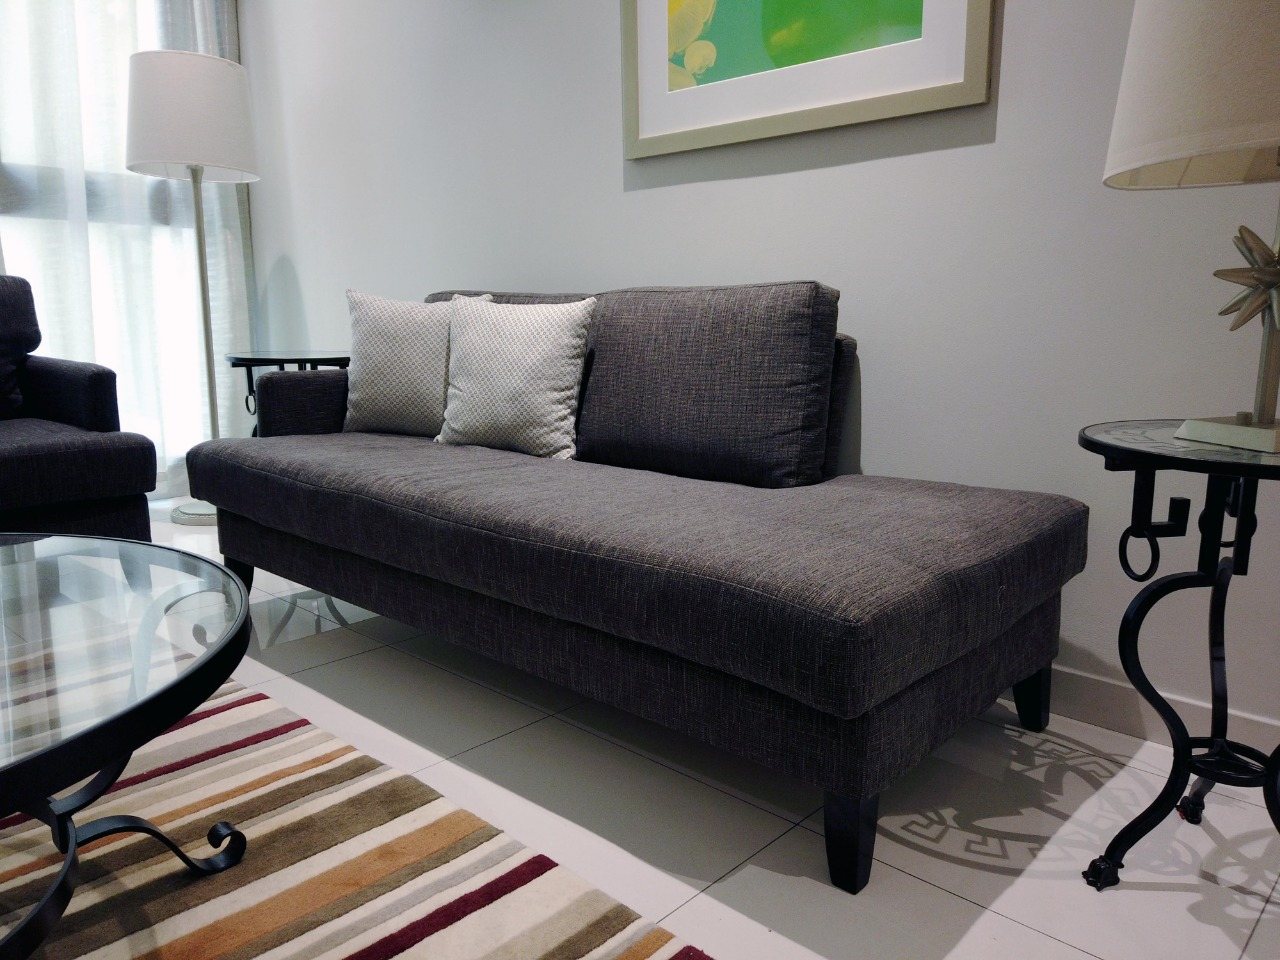 Apartment Meydan Spacious Home Dubai photo 27263222